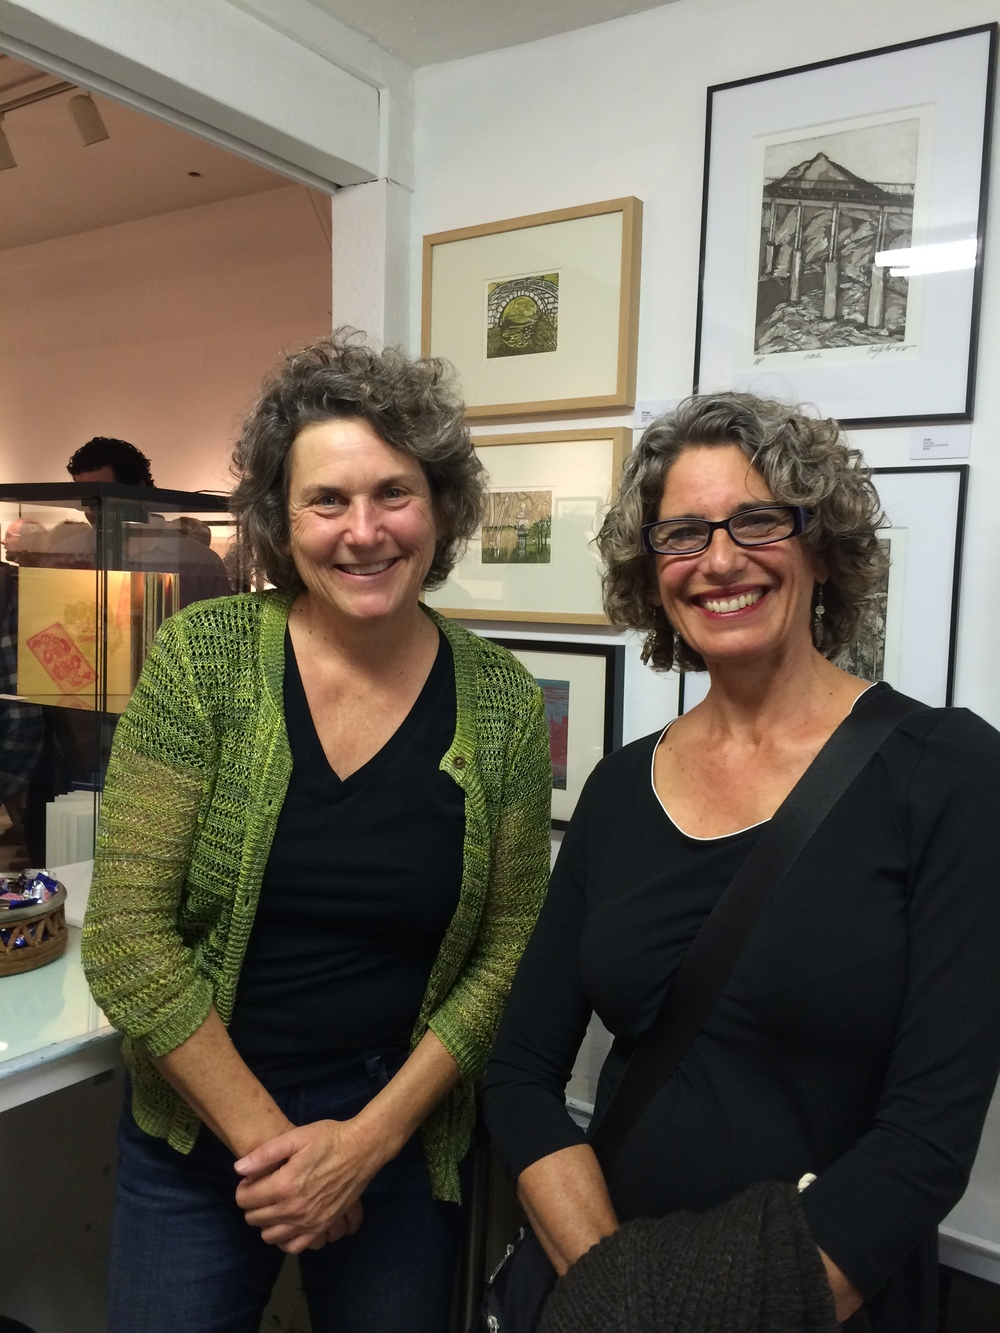 BPP member Carolyn La France & Cate Bell